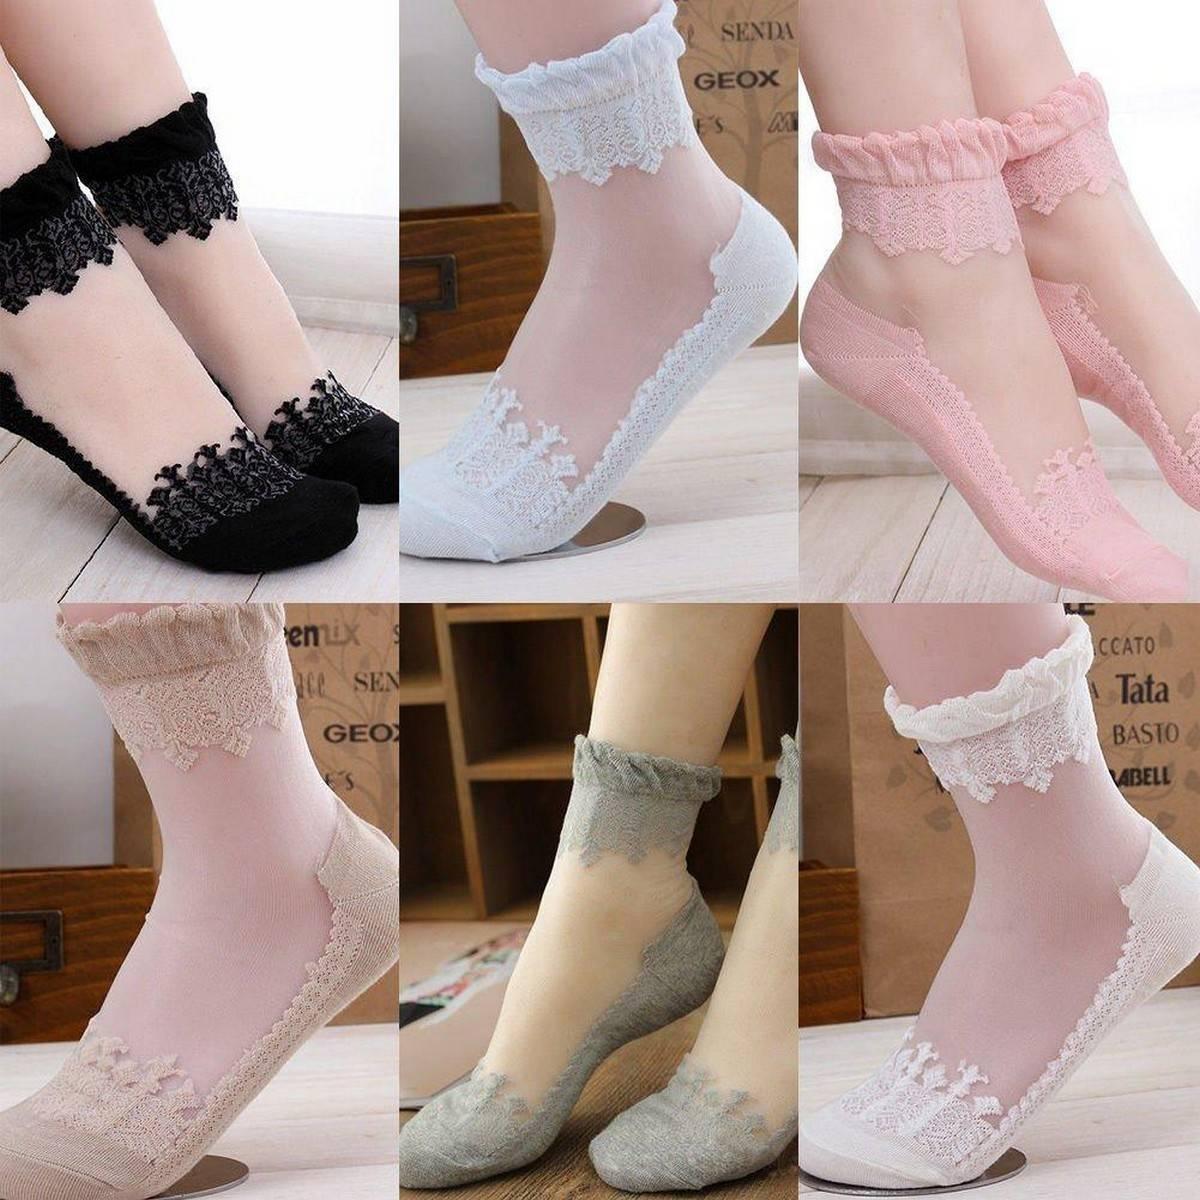 [Lovely Design] Women''s Ultrathin Transparent Beautiful Crystal Silk Lace Elastic Short Socks 4 Pair - Order Now !